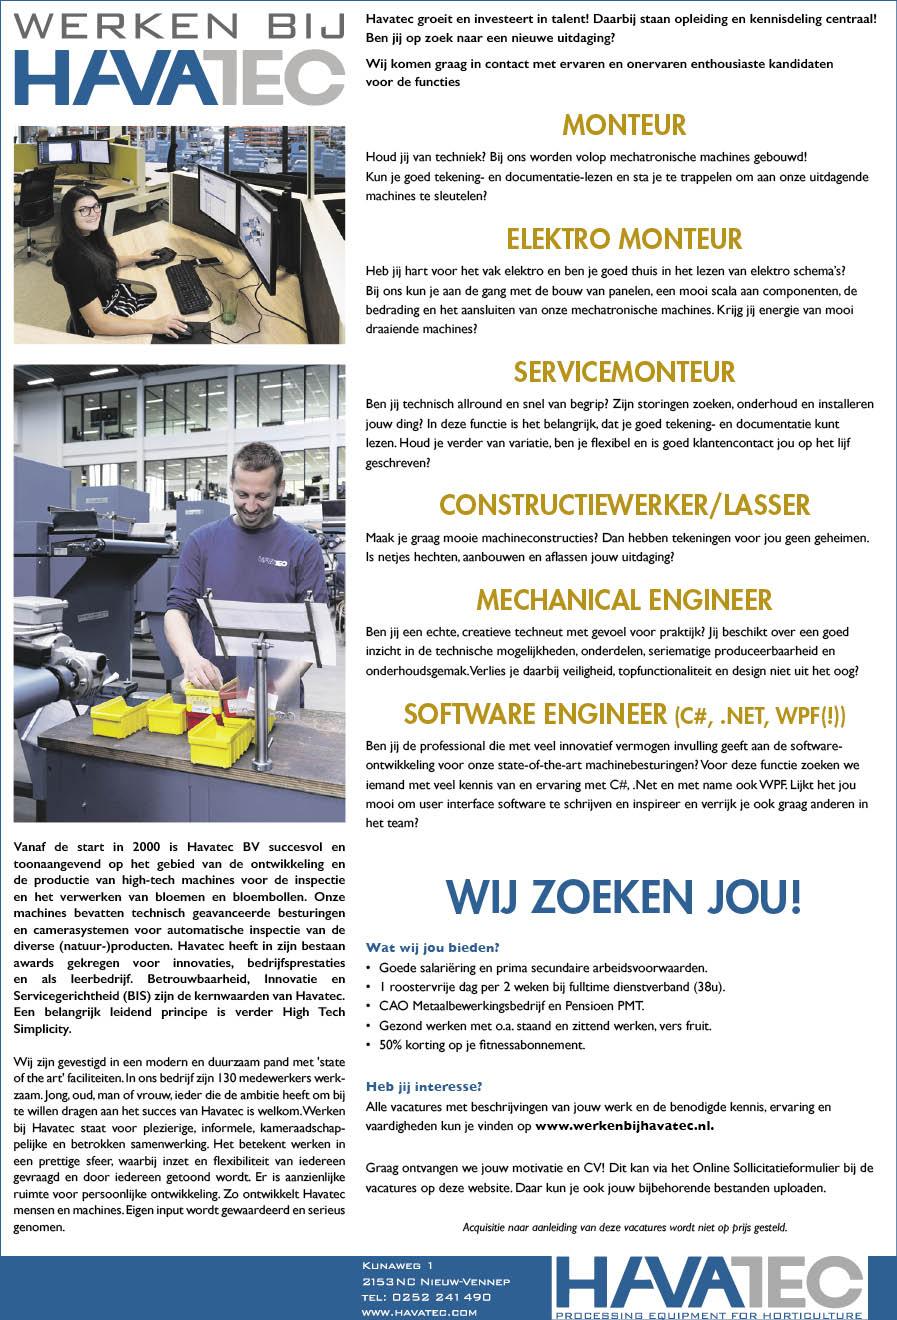 Vacature Mechanical Engineer